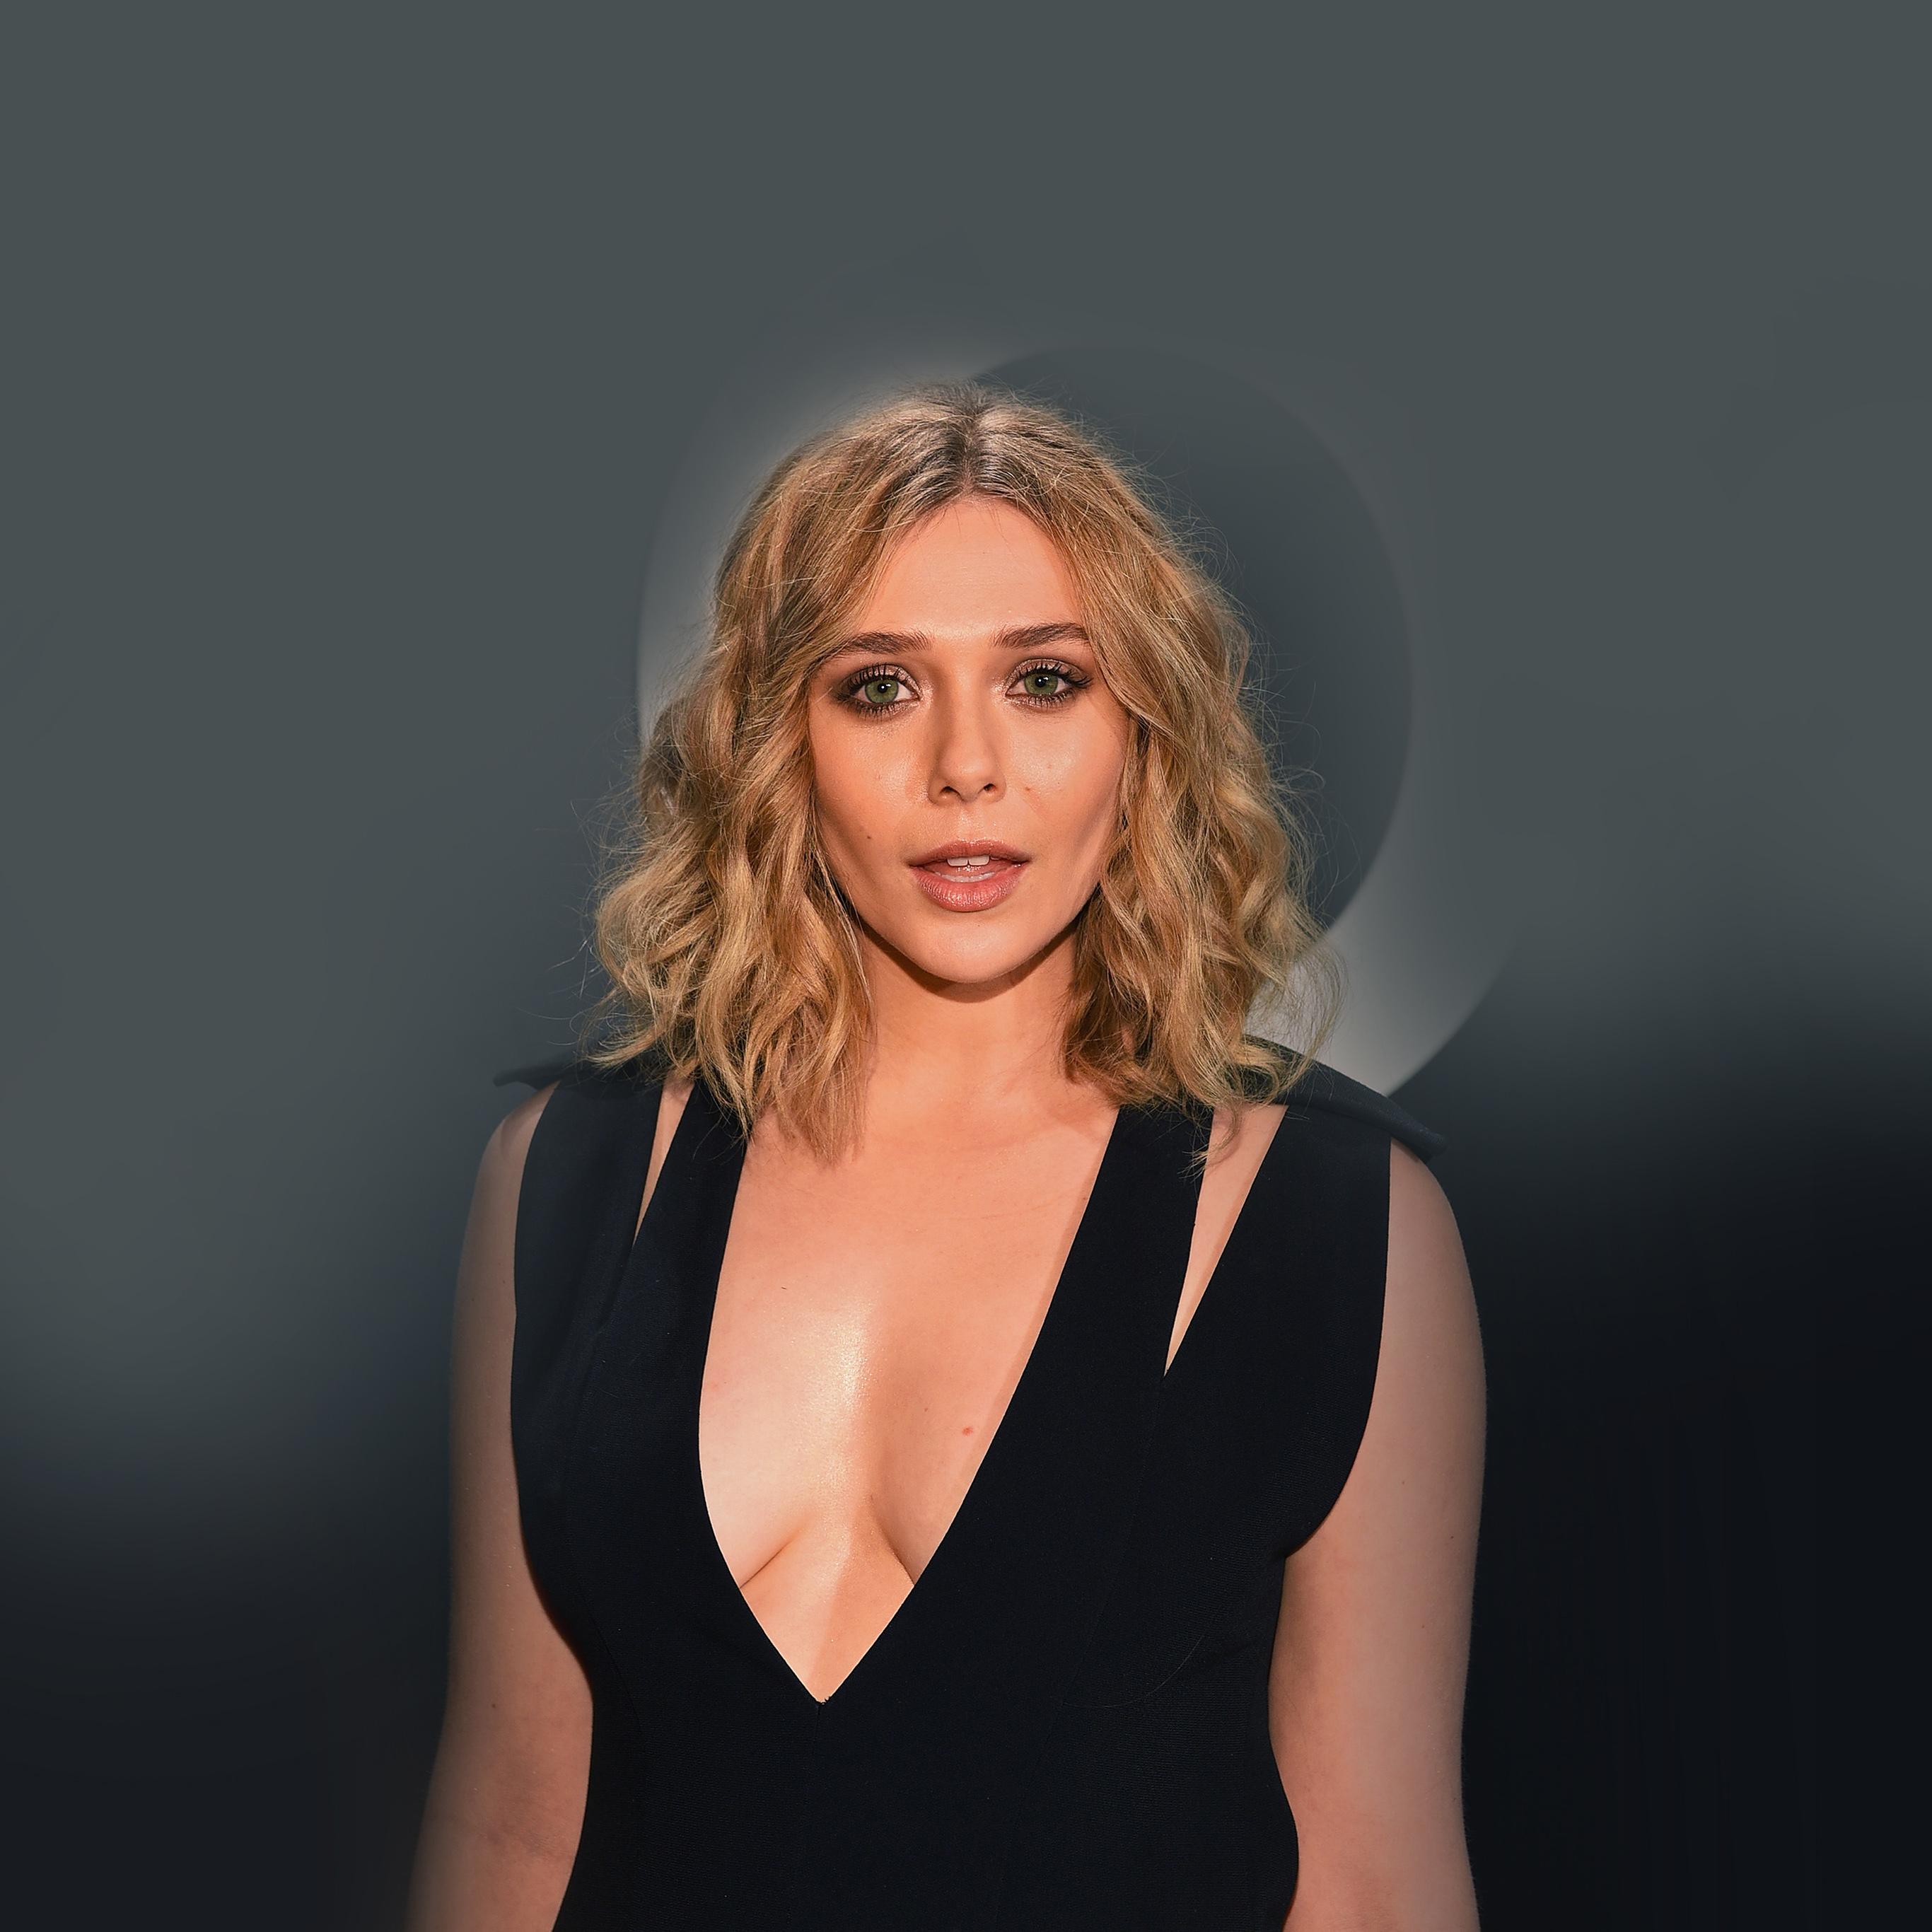 Hf40 Elizabeth Olsen Avengers Scarlett Witch Hero Papers Co